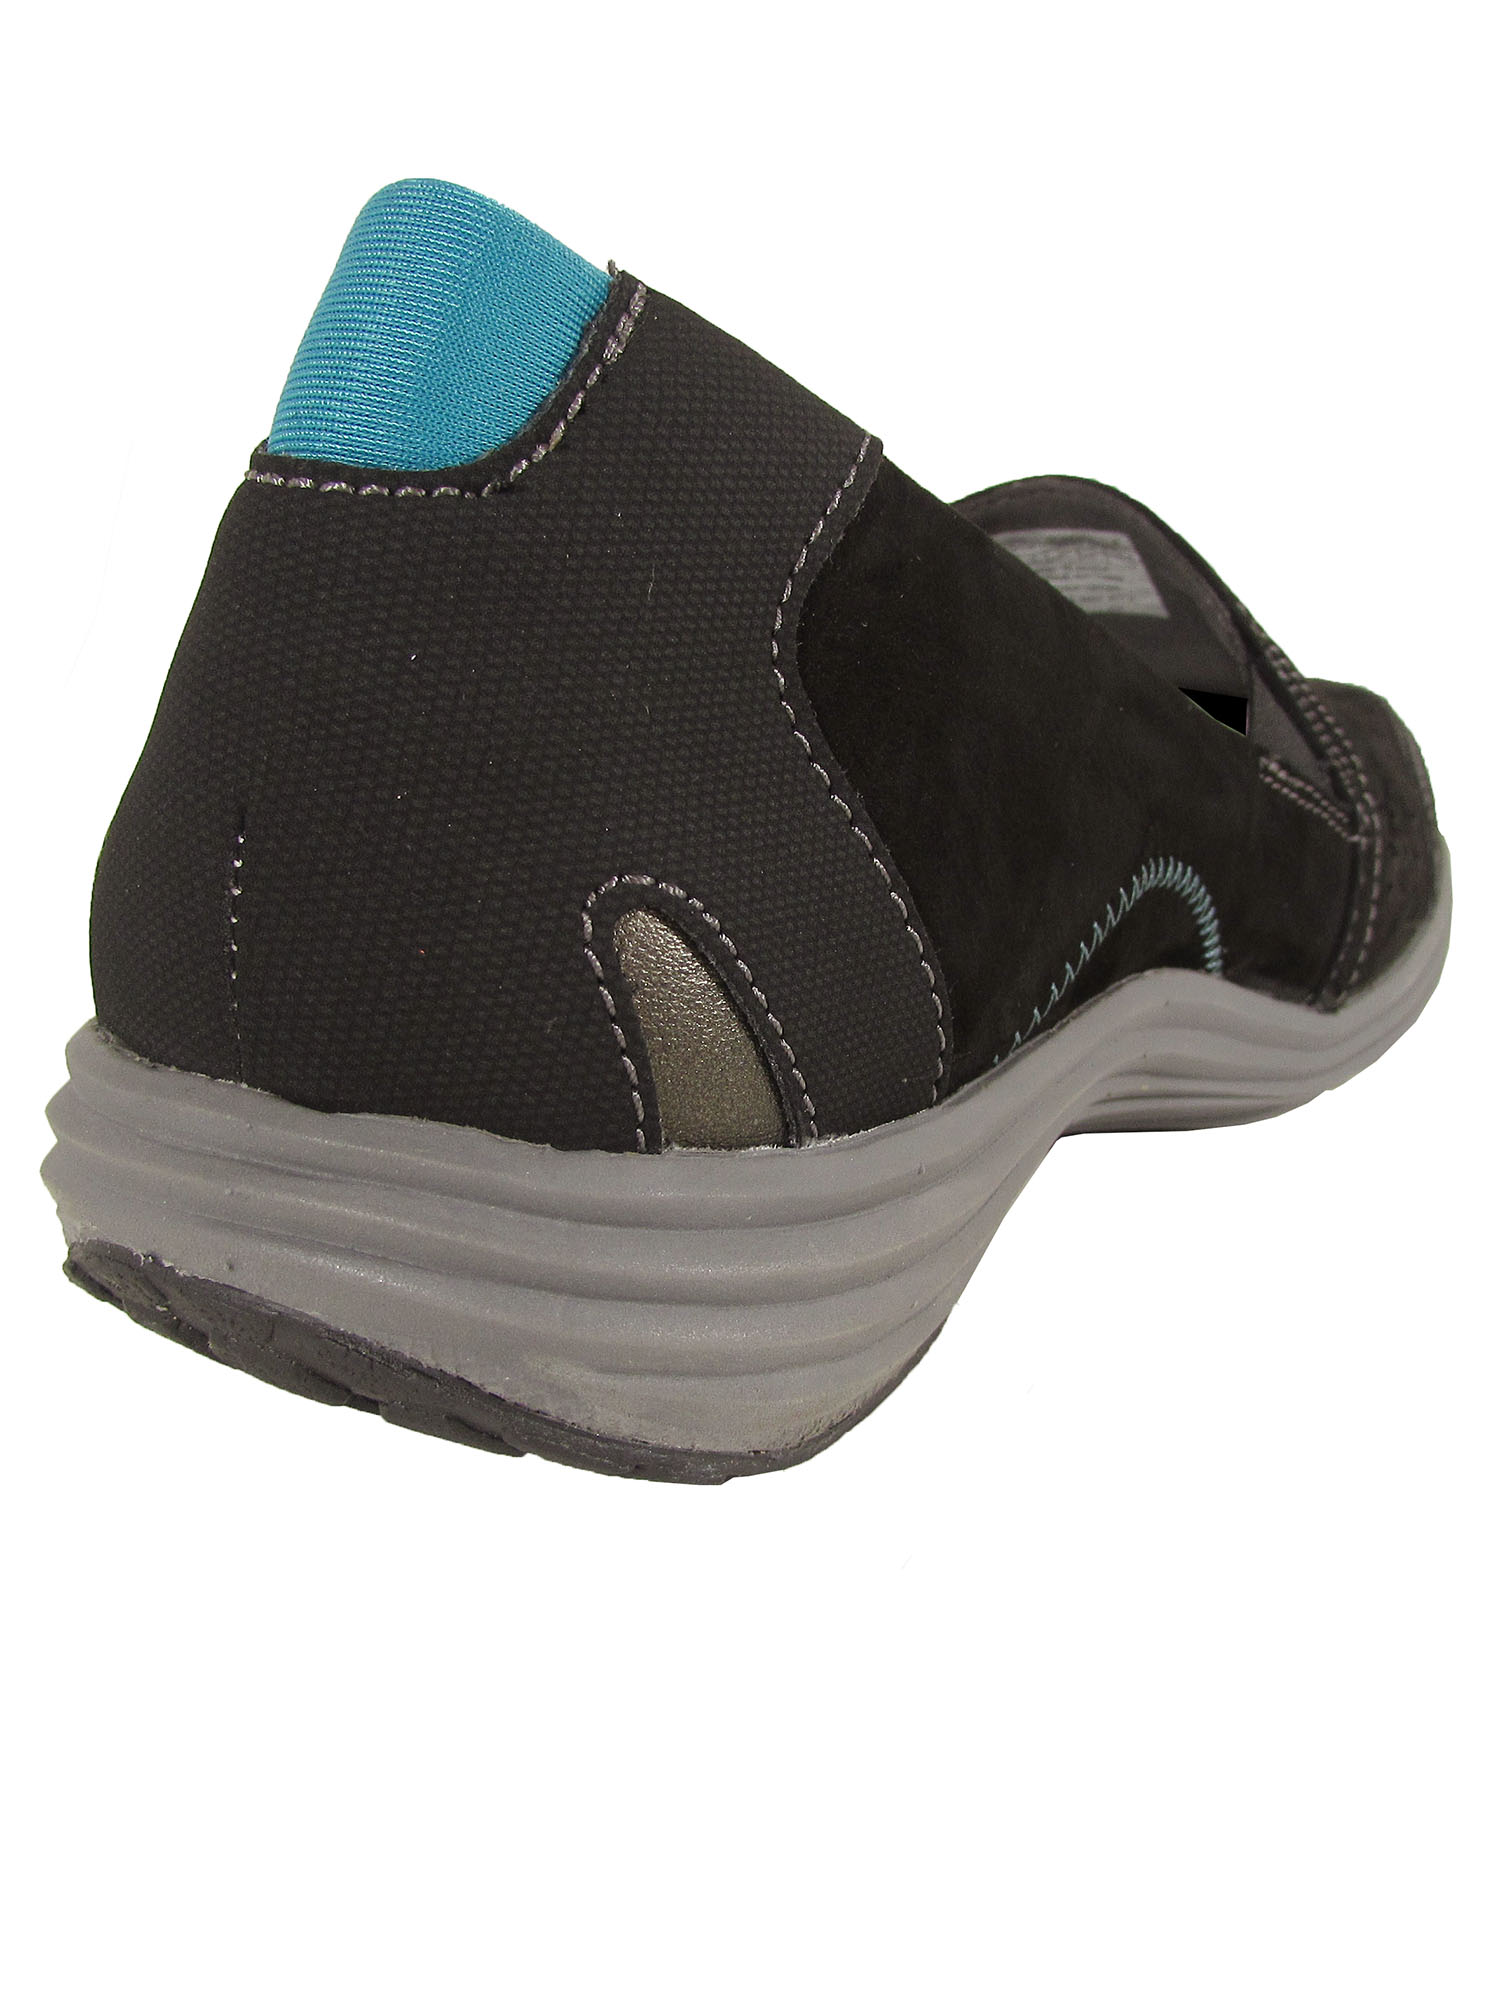 Aravon-Womens-Bonnie-AR-Slip-On-Loafer-Shoes miniatura 4